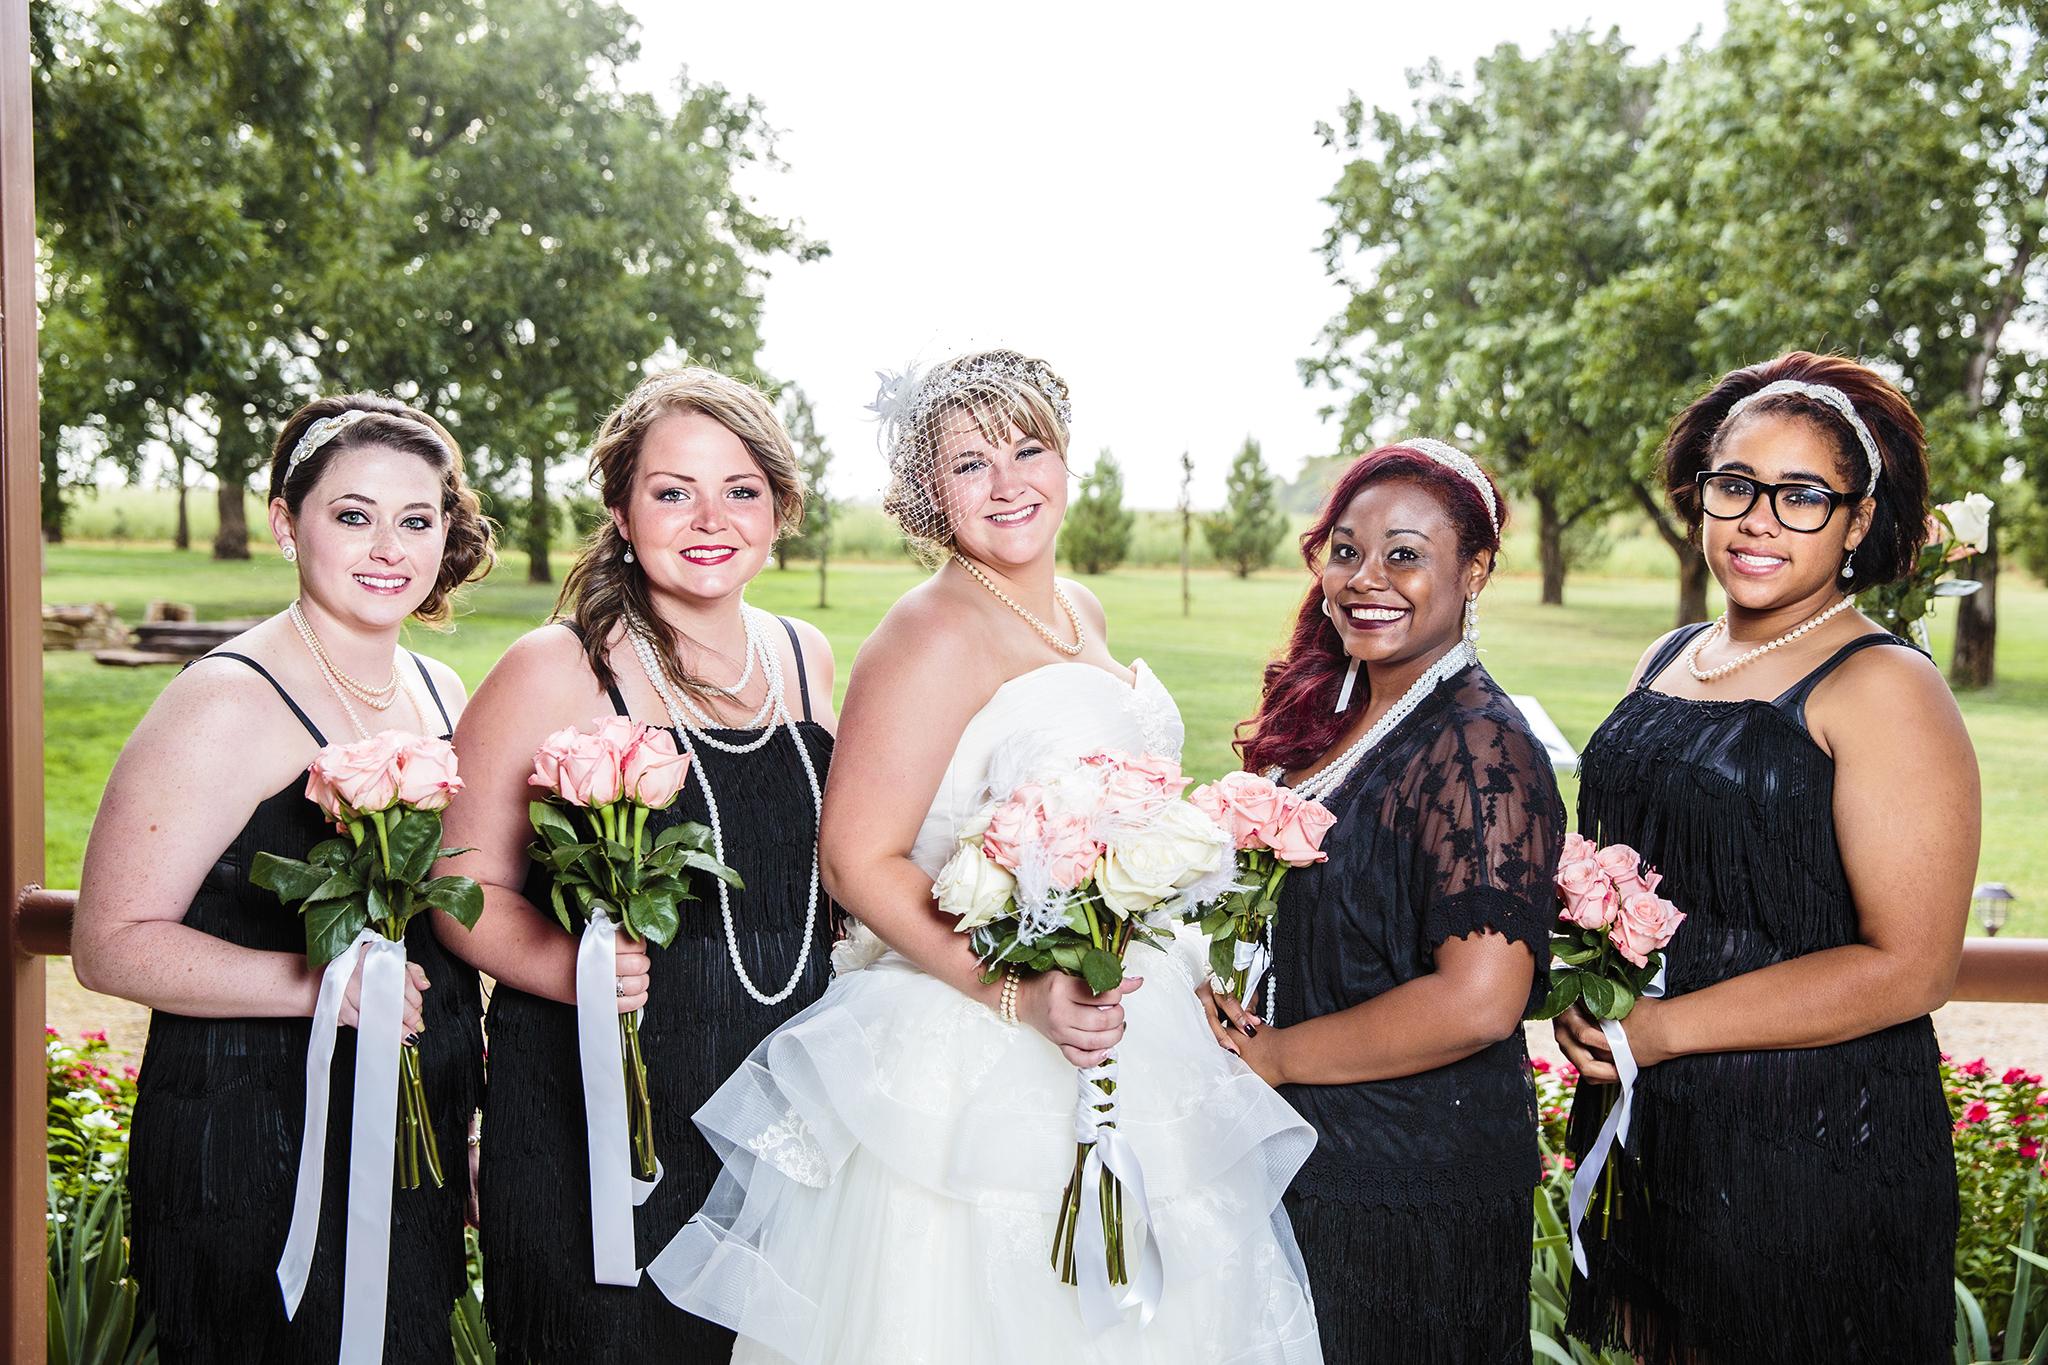 Bridal Party, Bridesmaids, Walnut Tree Weddings